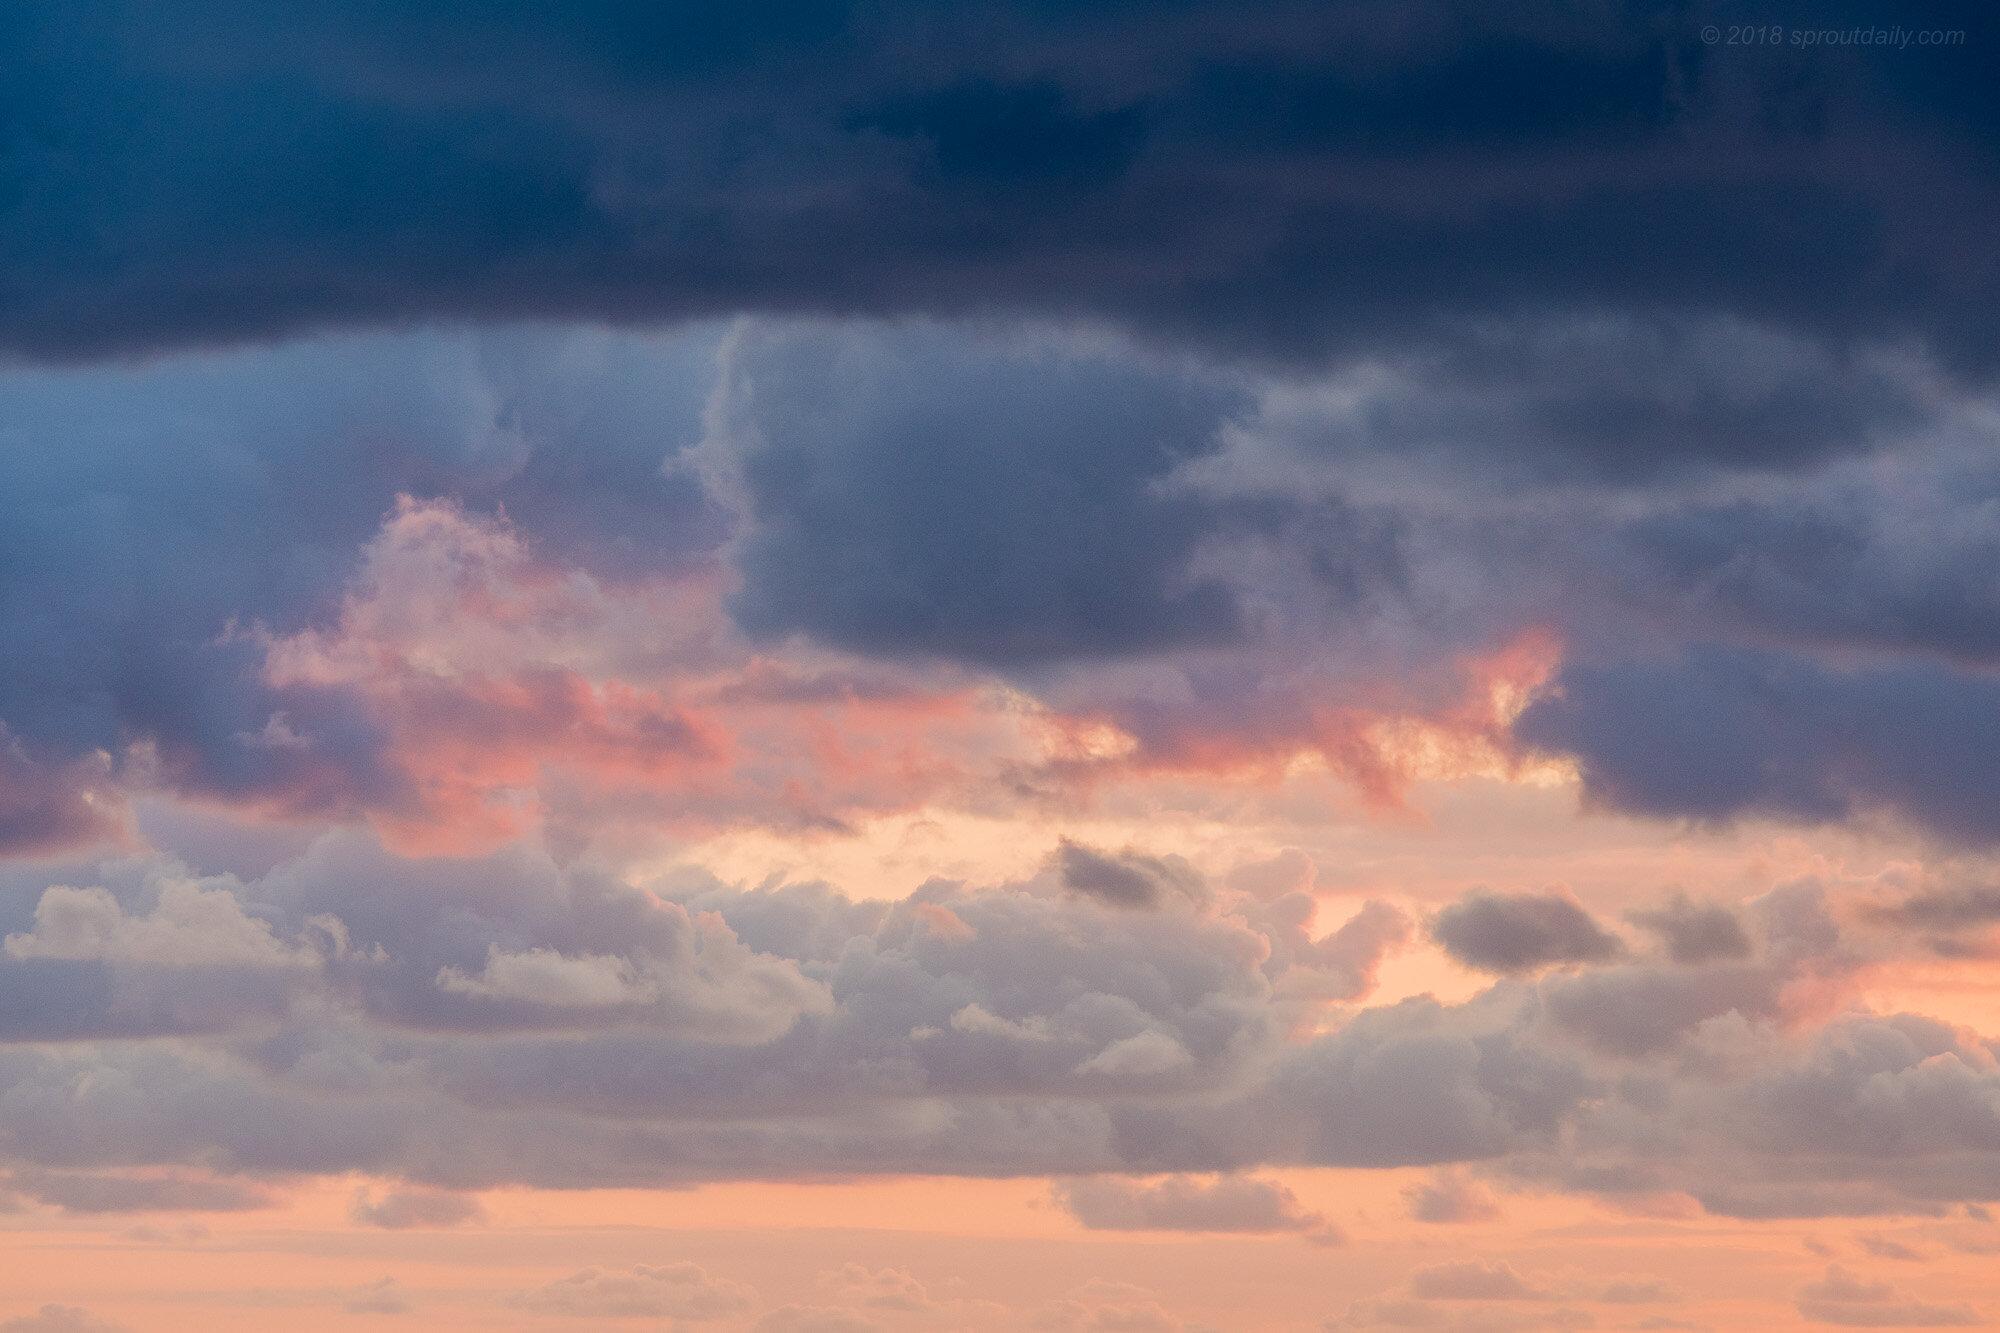 5:46am - #Cloudporn